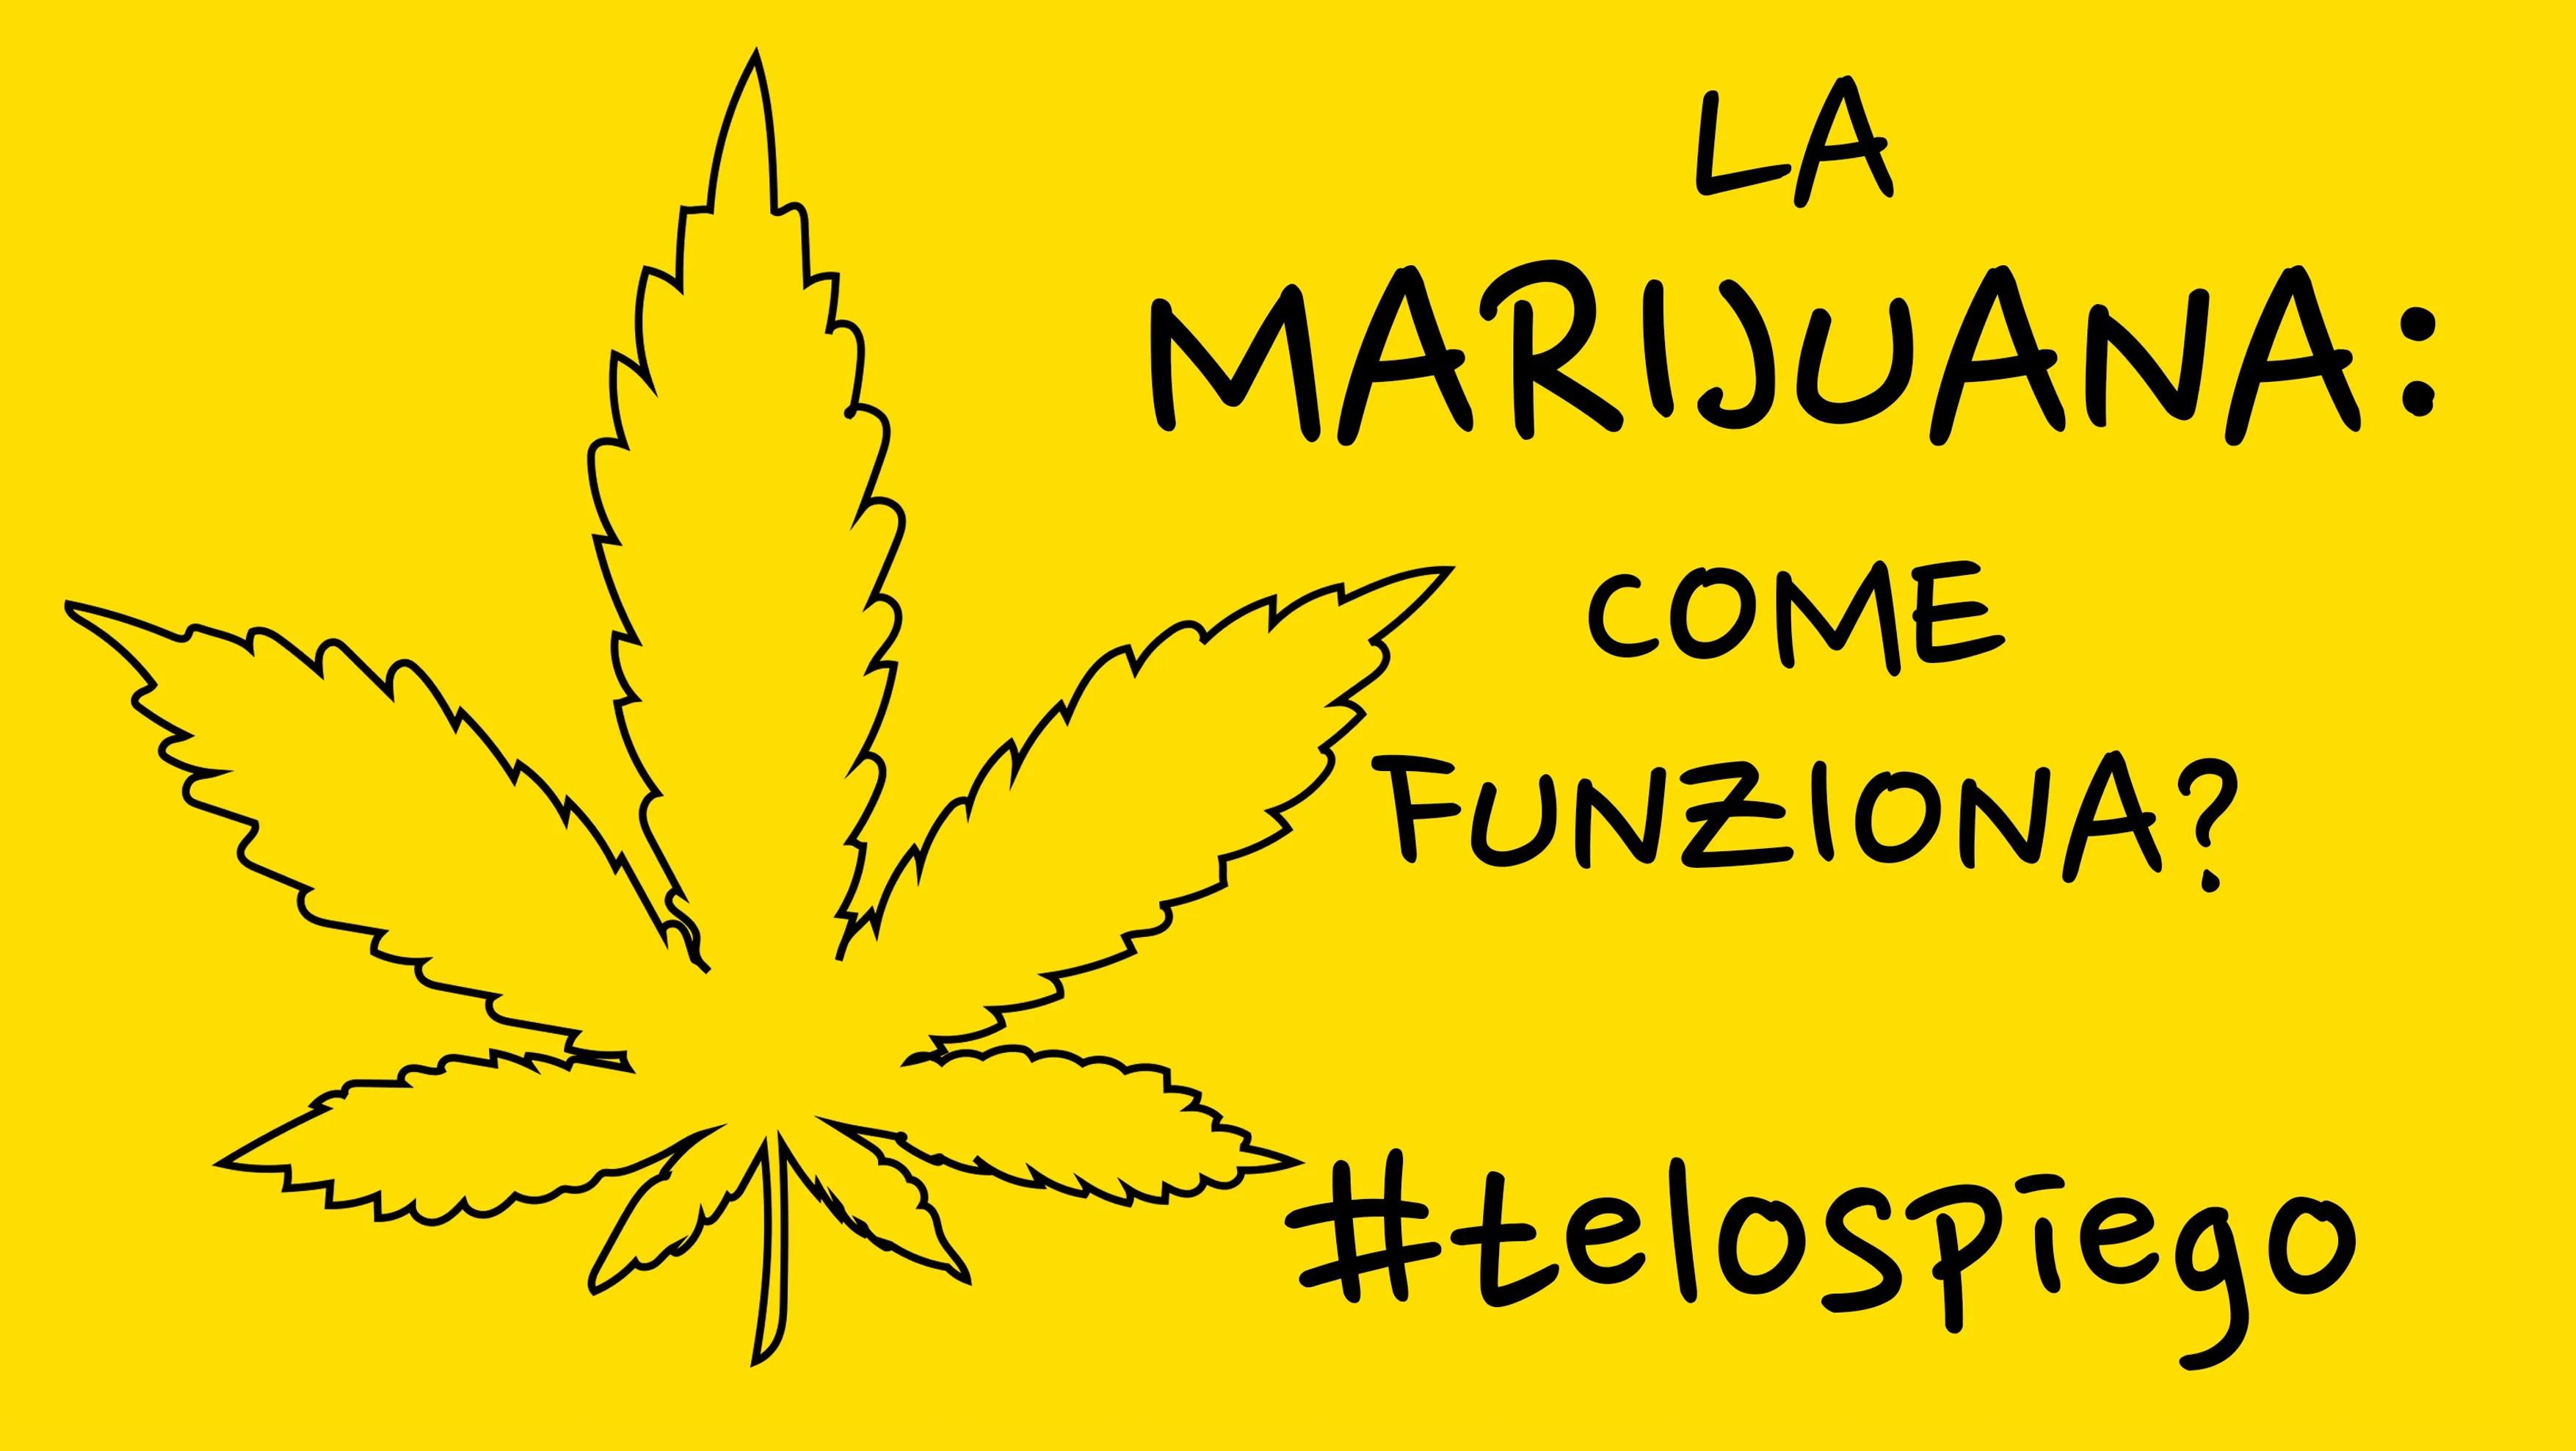 COME FUNZIONA LA #MARIJUANA? #TELOSPIEGO